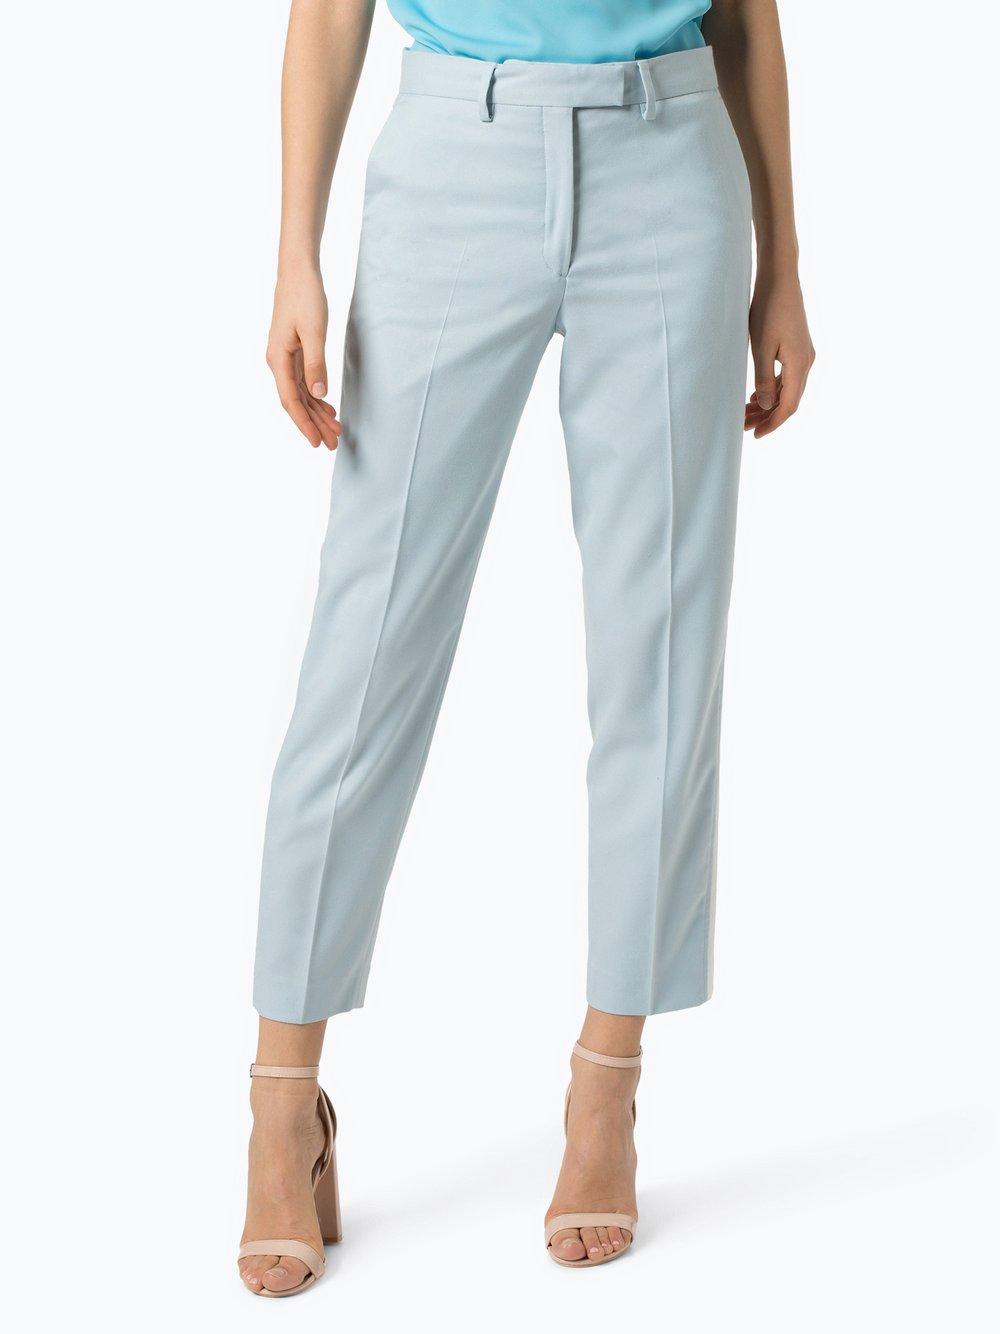 Calvin Klein - Spodnie damskie, niebieski